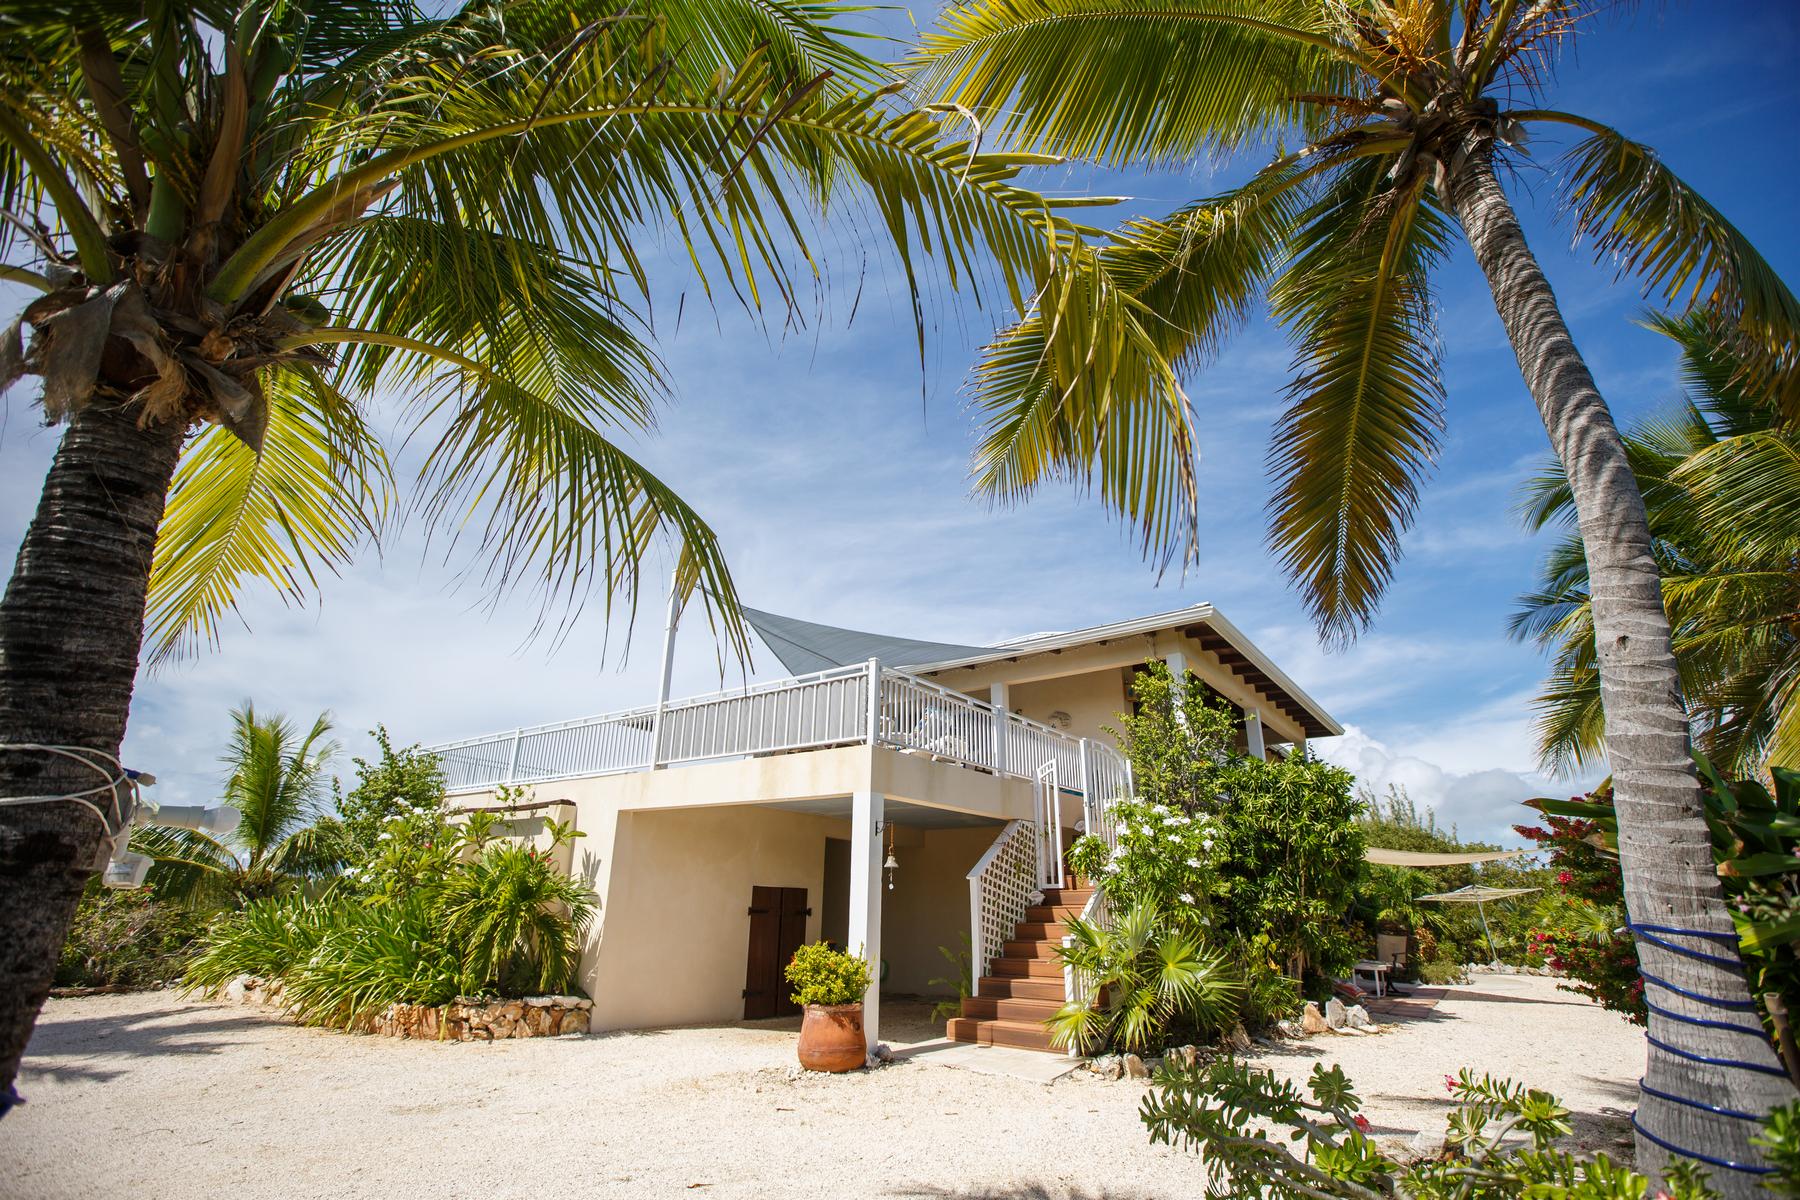 Single Family Home for Sale at Casa De Isle Sapodilla Bay, Providenciales Turks And Caicos Islands